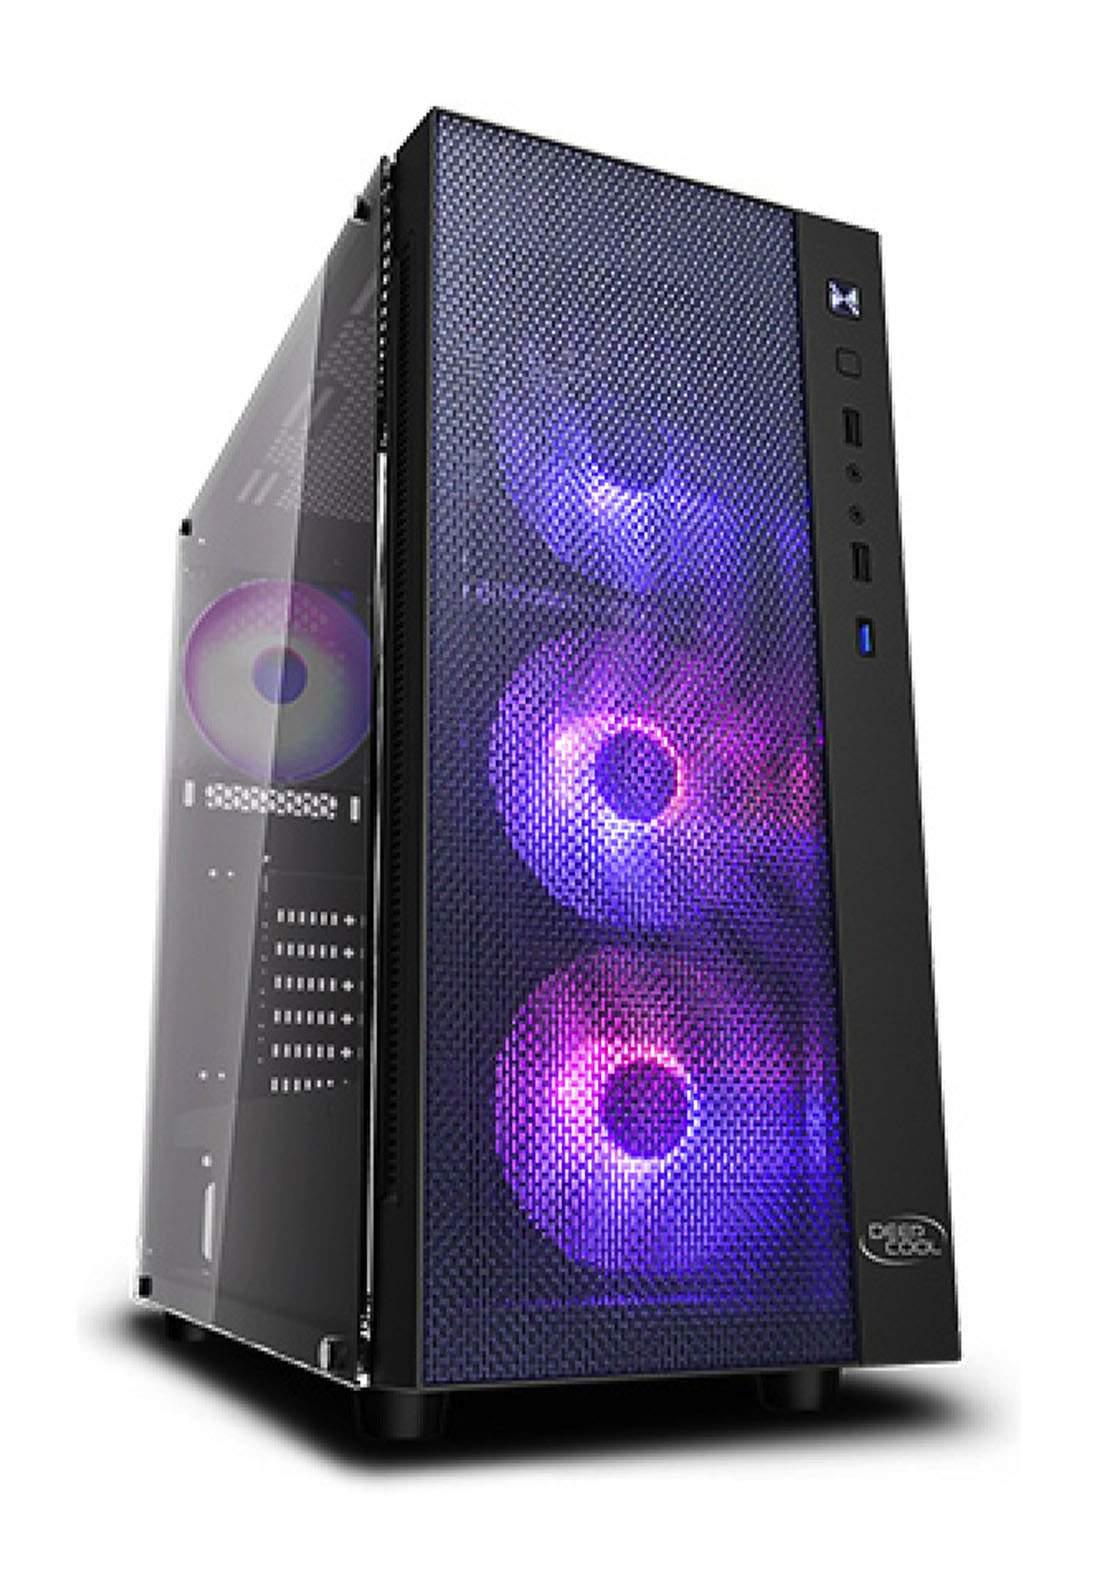 Deepcool Matrexx 55 Mesh Rgb  Mid Tower Gaming Case - Black  كيس حاسبة